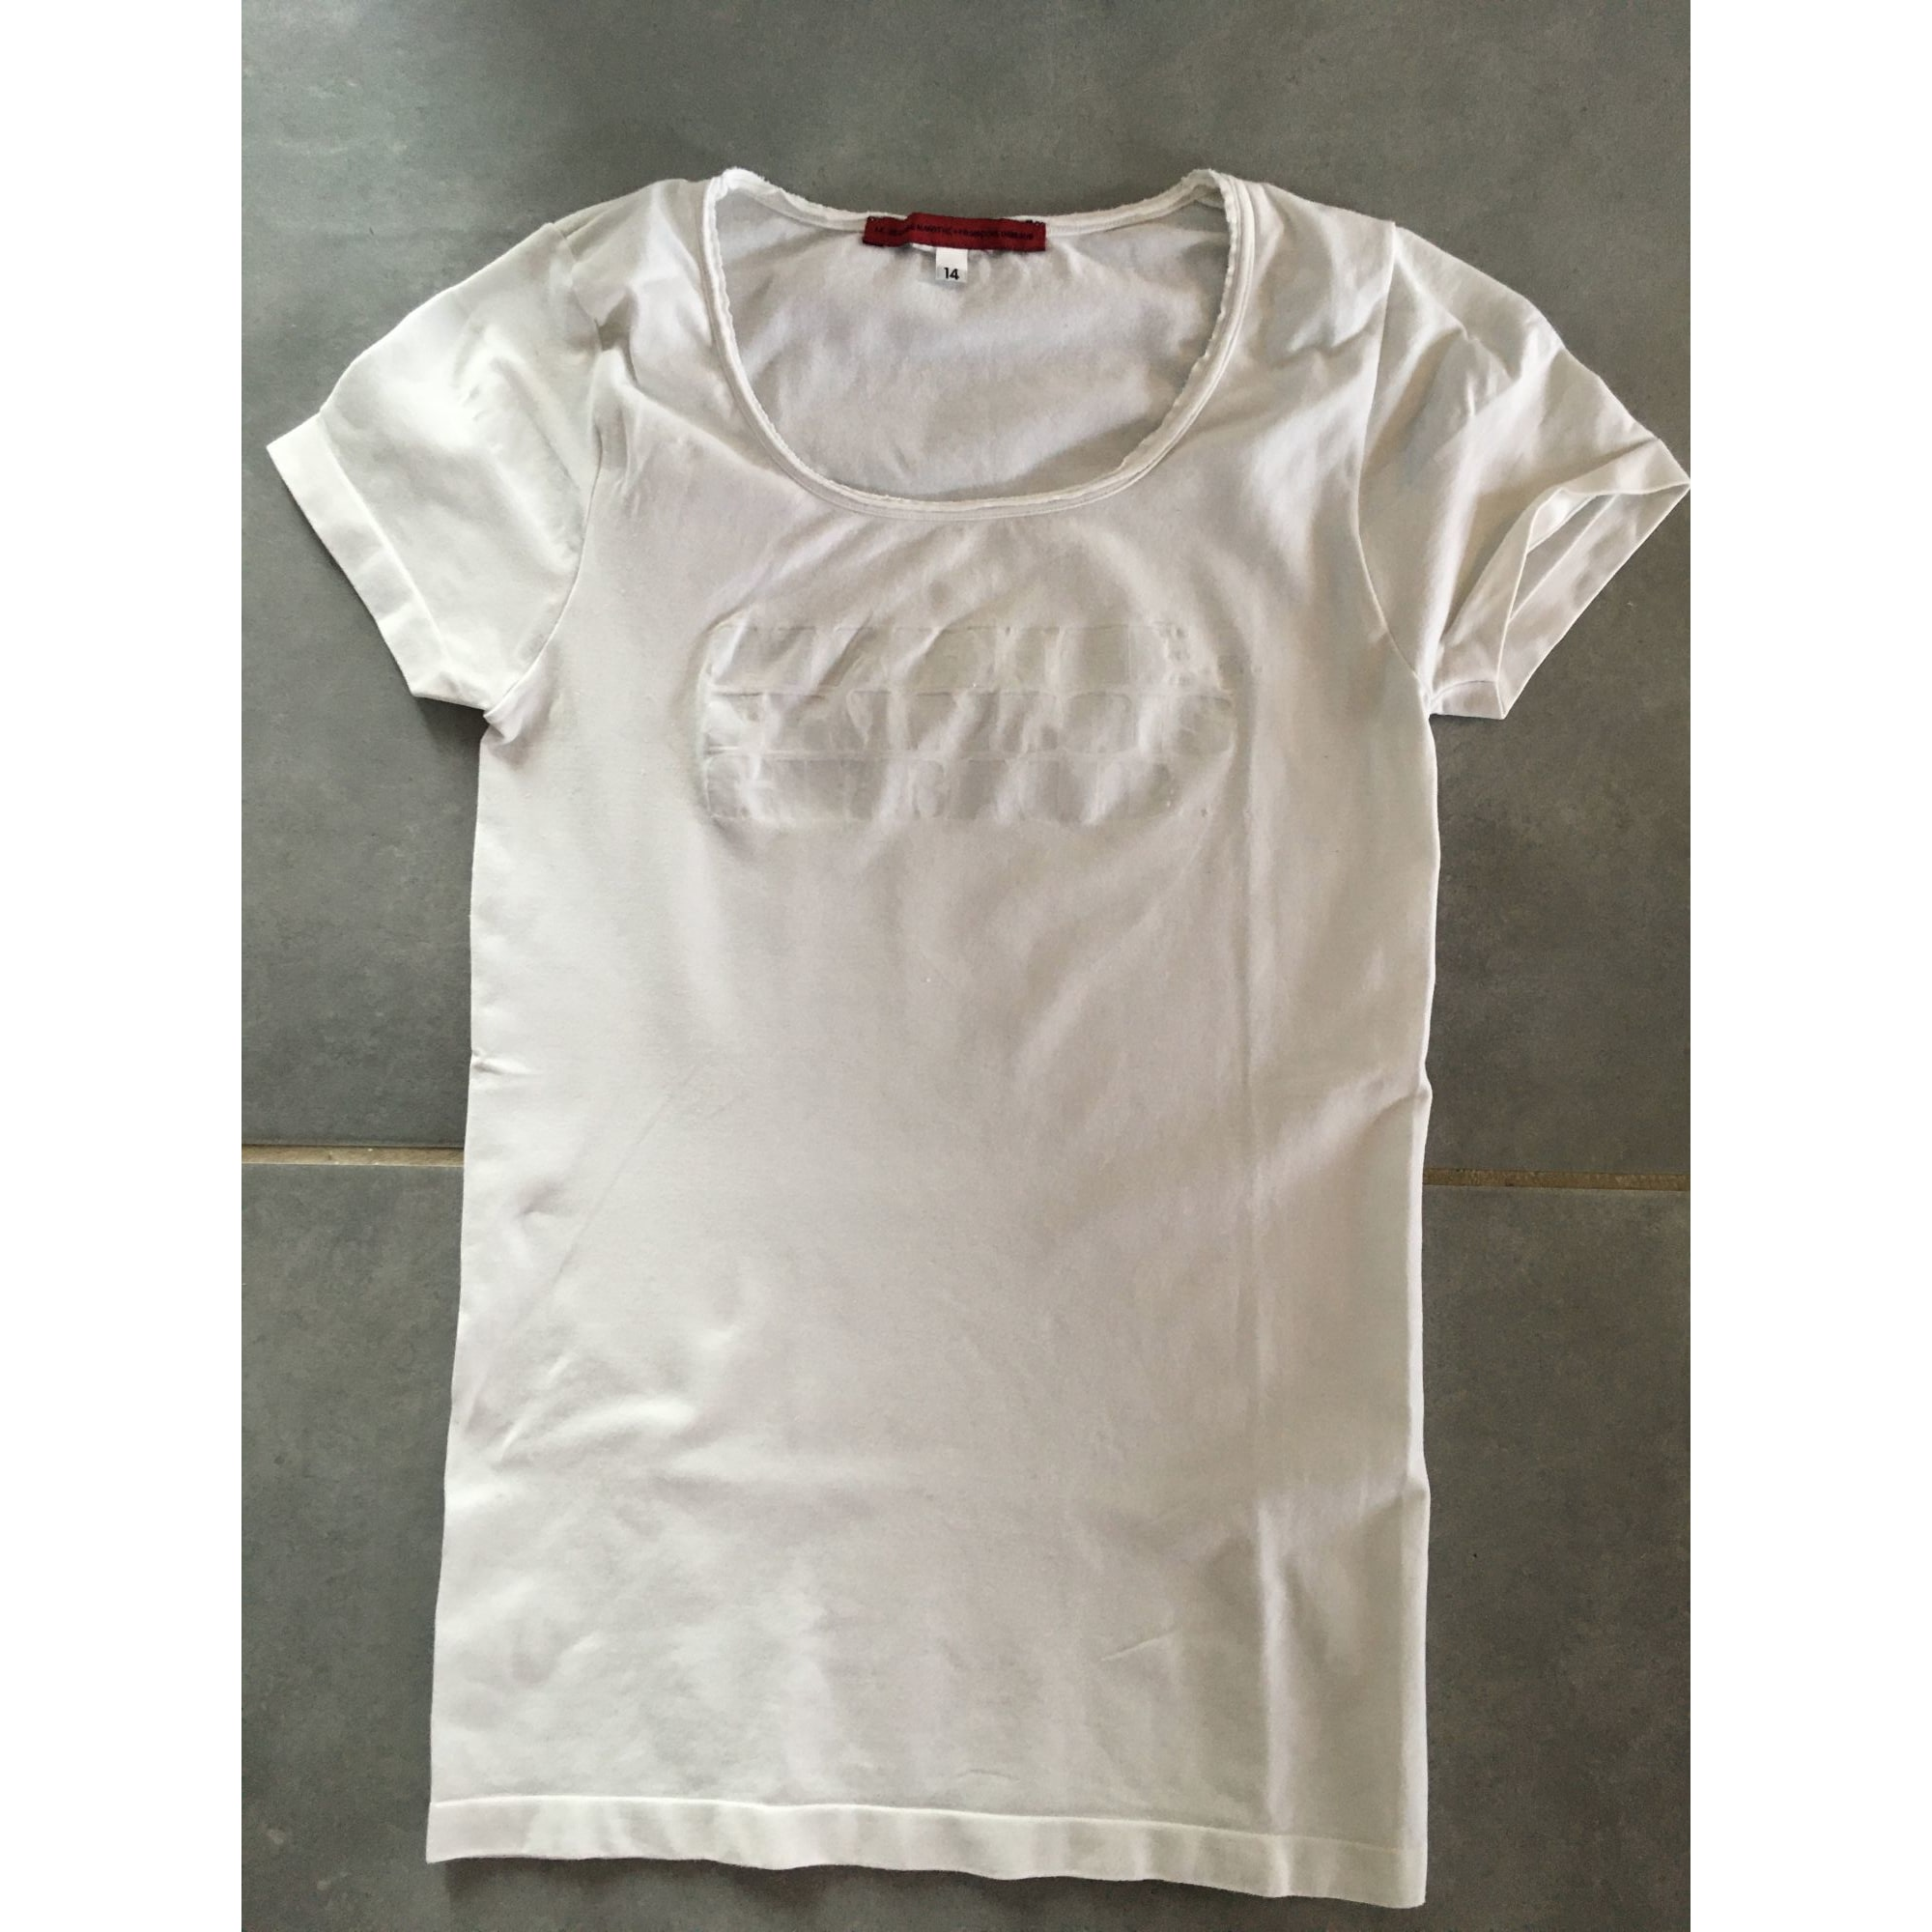 Top, Tee-shirt MARITHÉ ET FRANÇOIS GIRBAUD Blanc, blanc cassé, écru